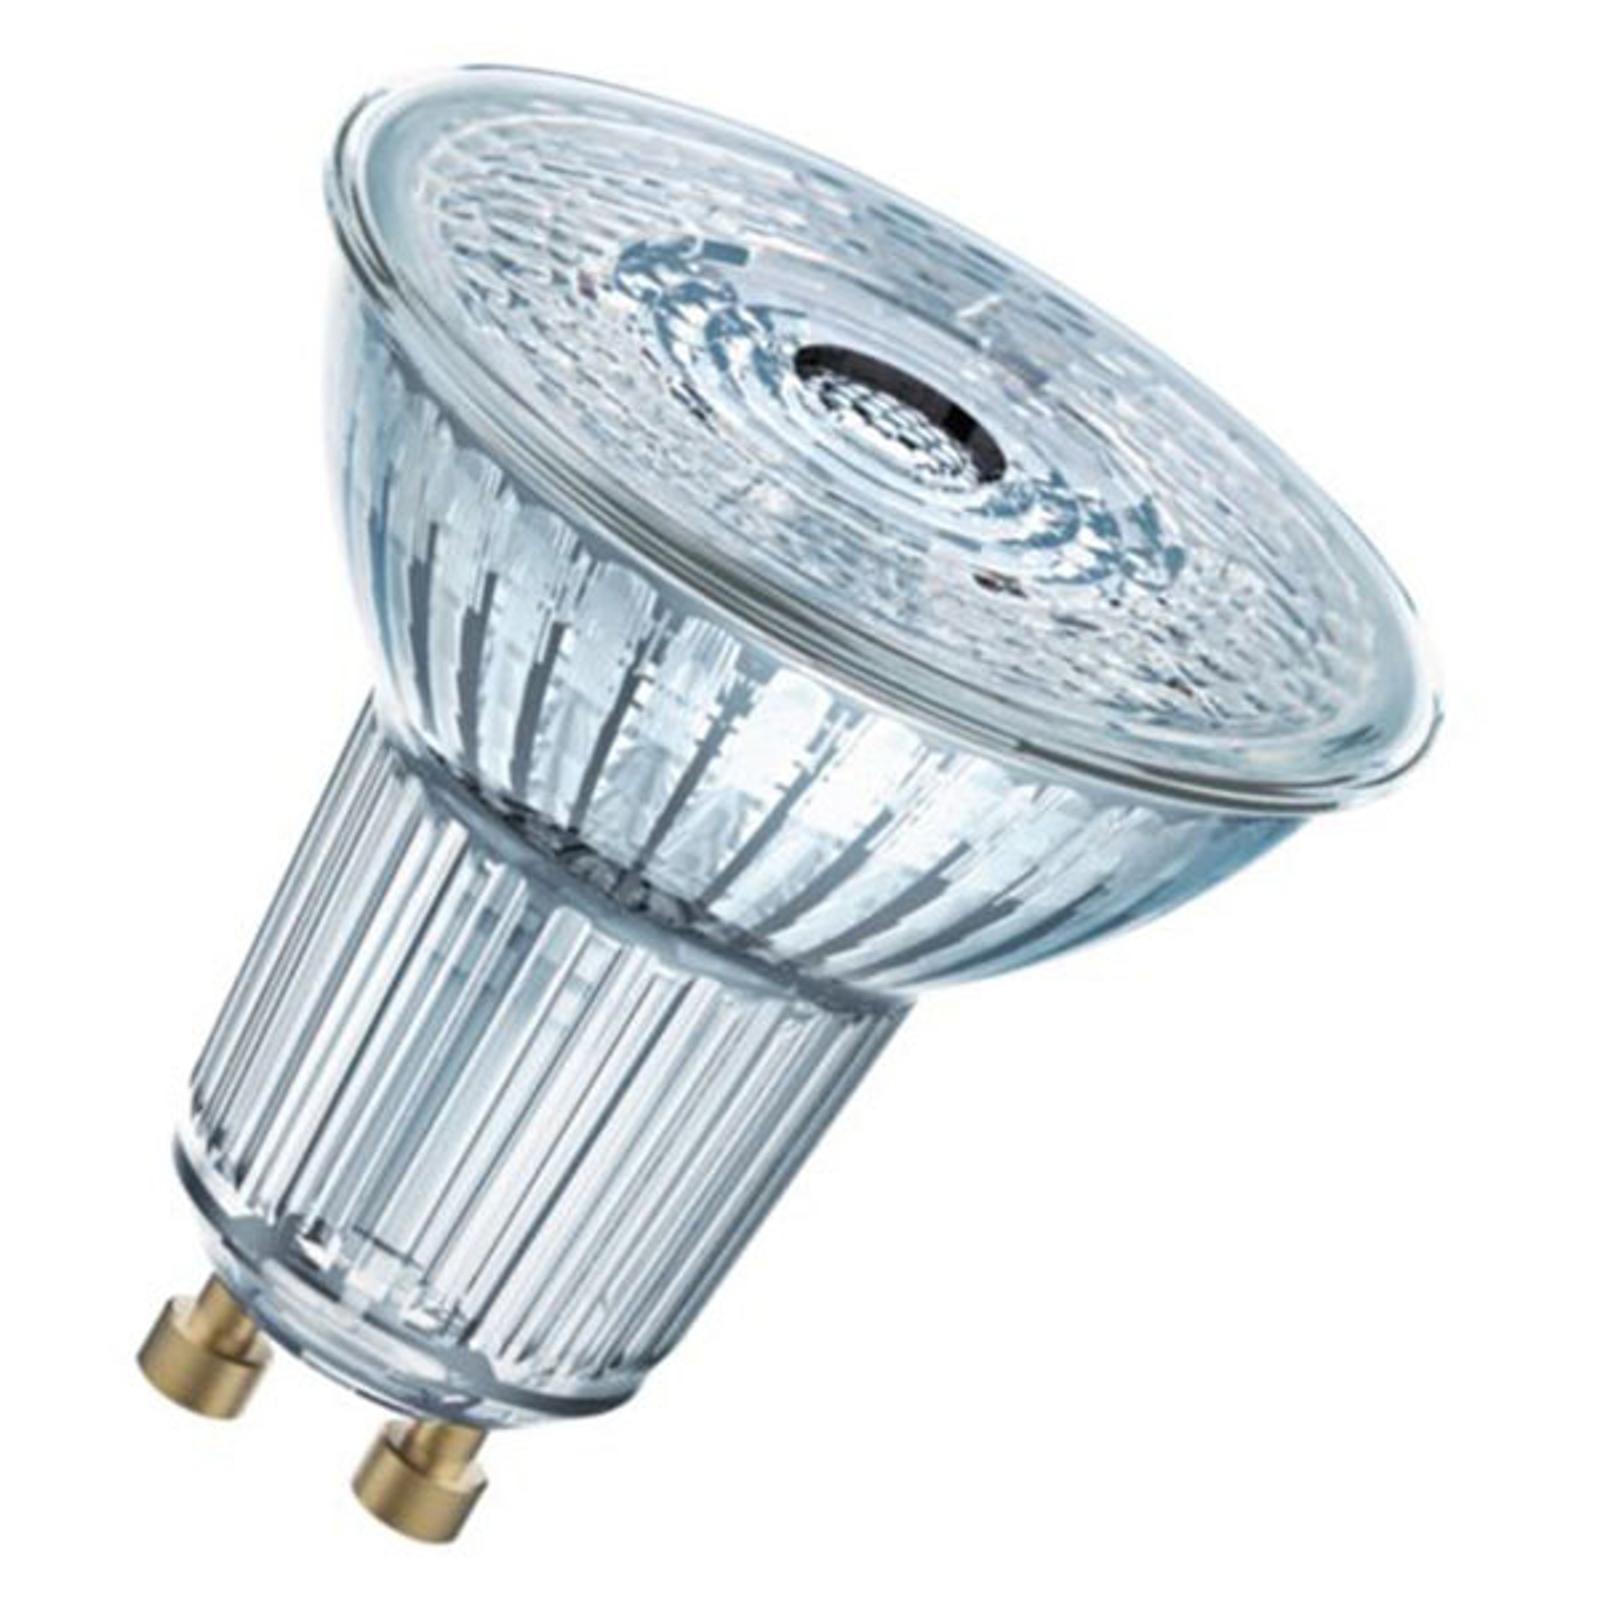 OSRAM szklany reflektor LED GU10 3,7W 927 36°